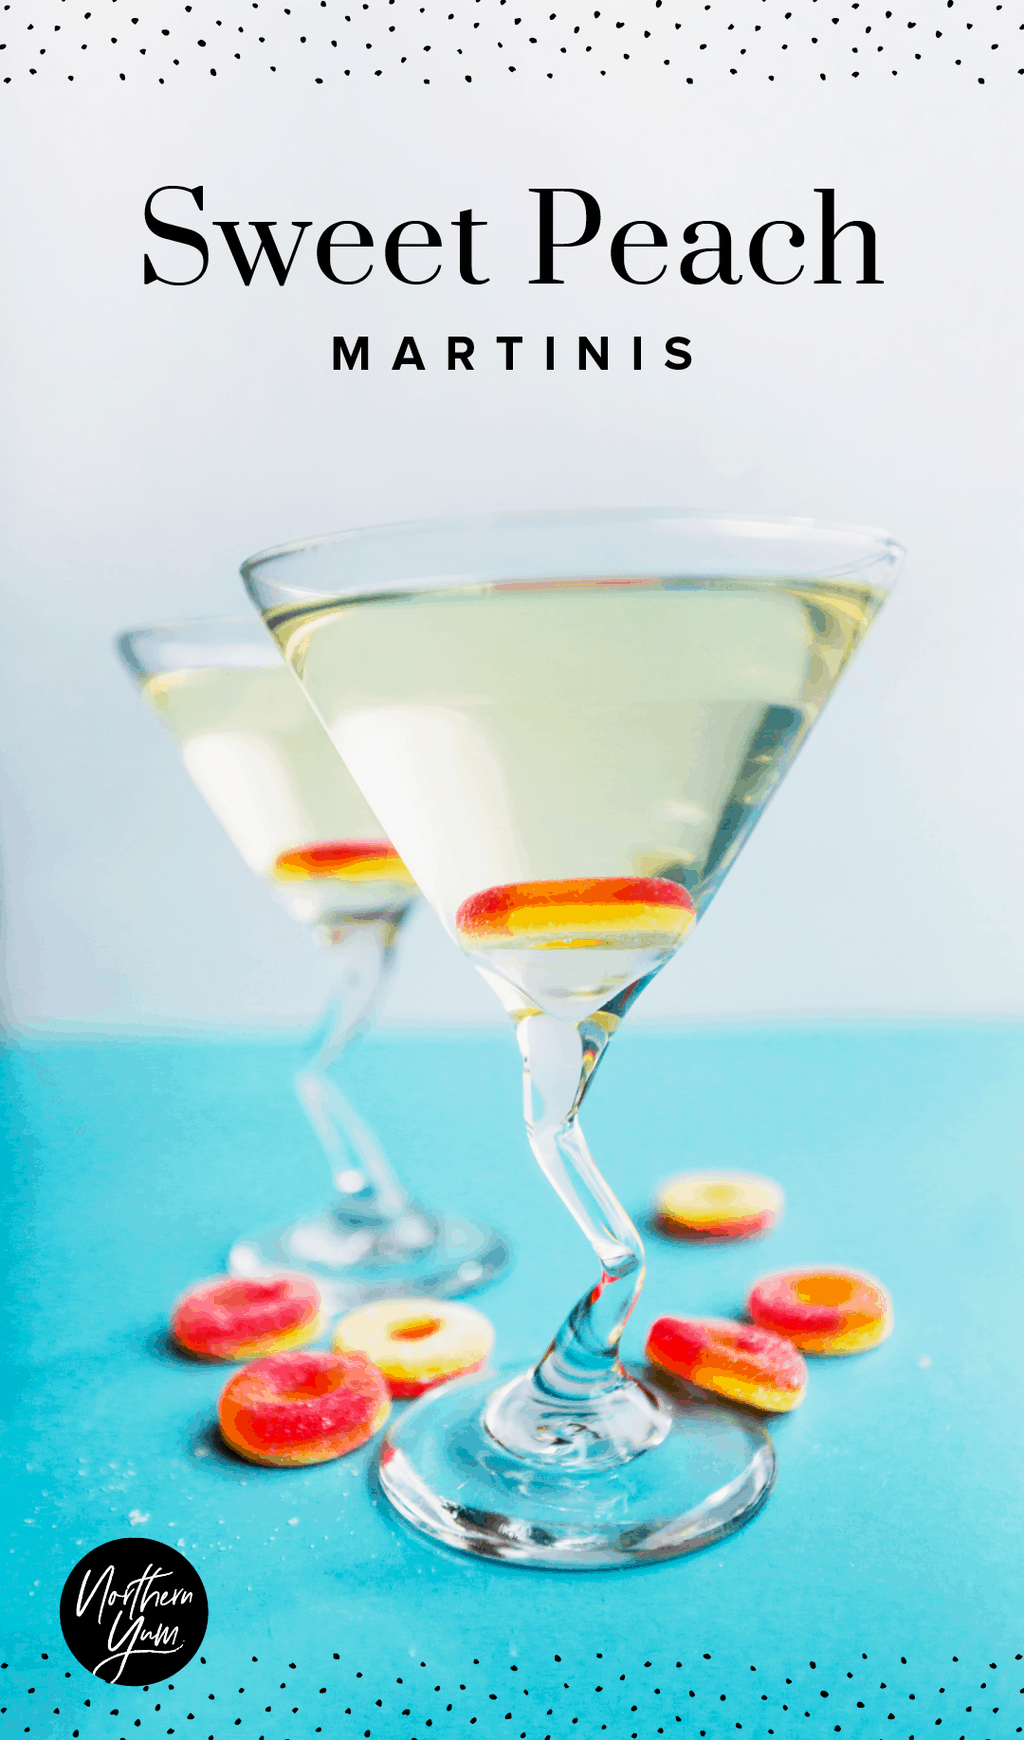 Peach martini recipe sweet peach martinis pin